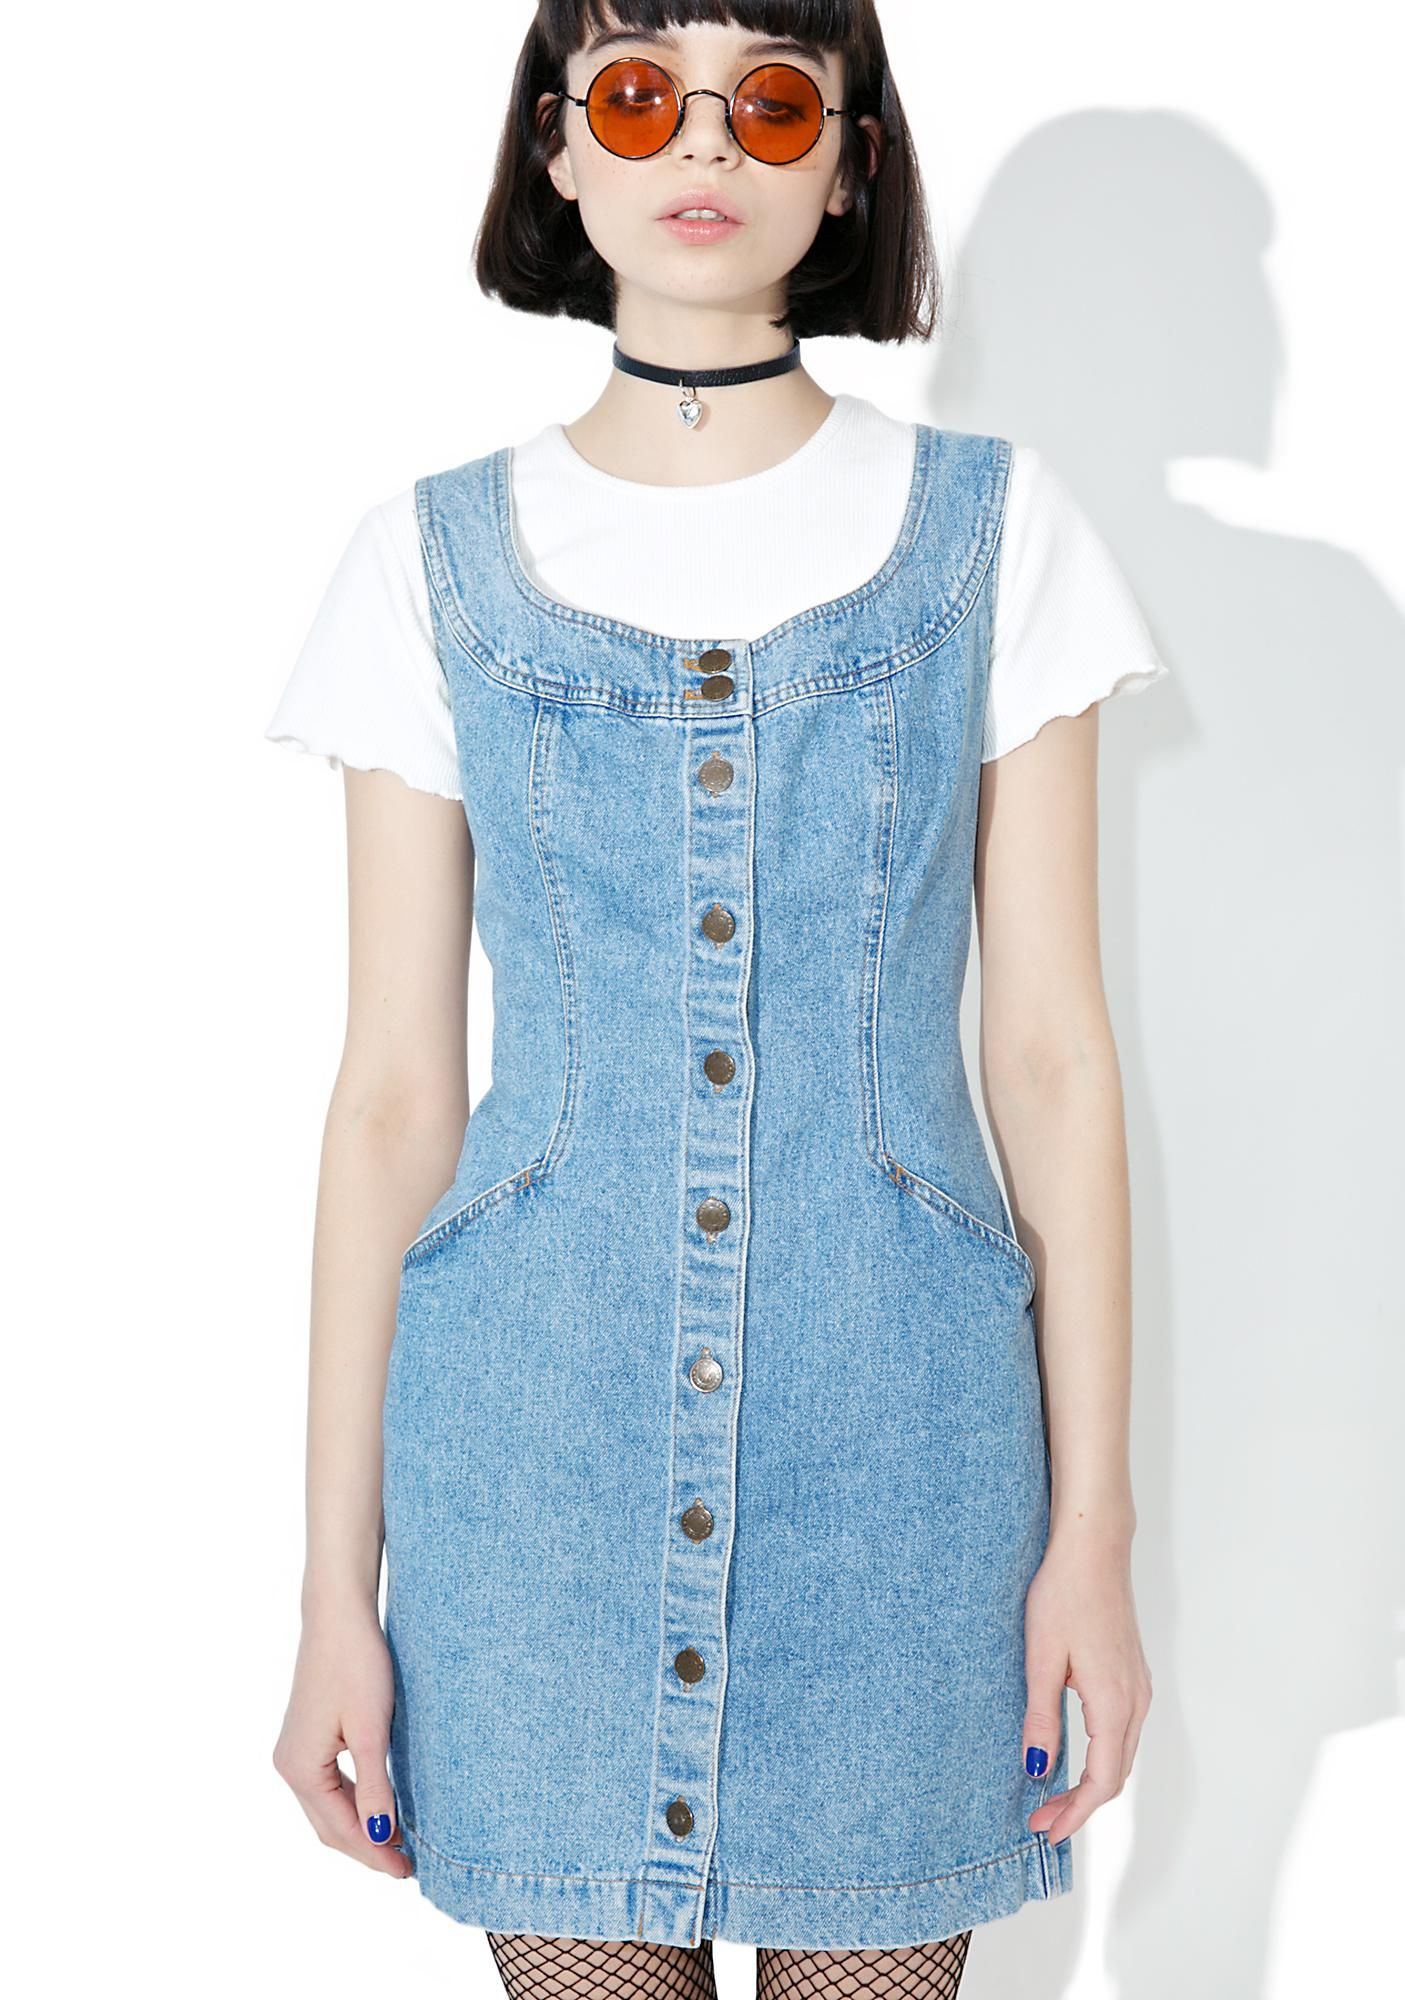 7c1a4ed9099 Vintage 90s DKNY Denim Mini Dress in 2019 | saga rose | Dresses ...